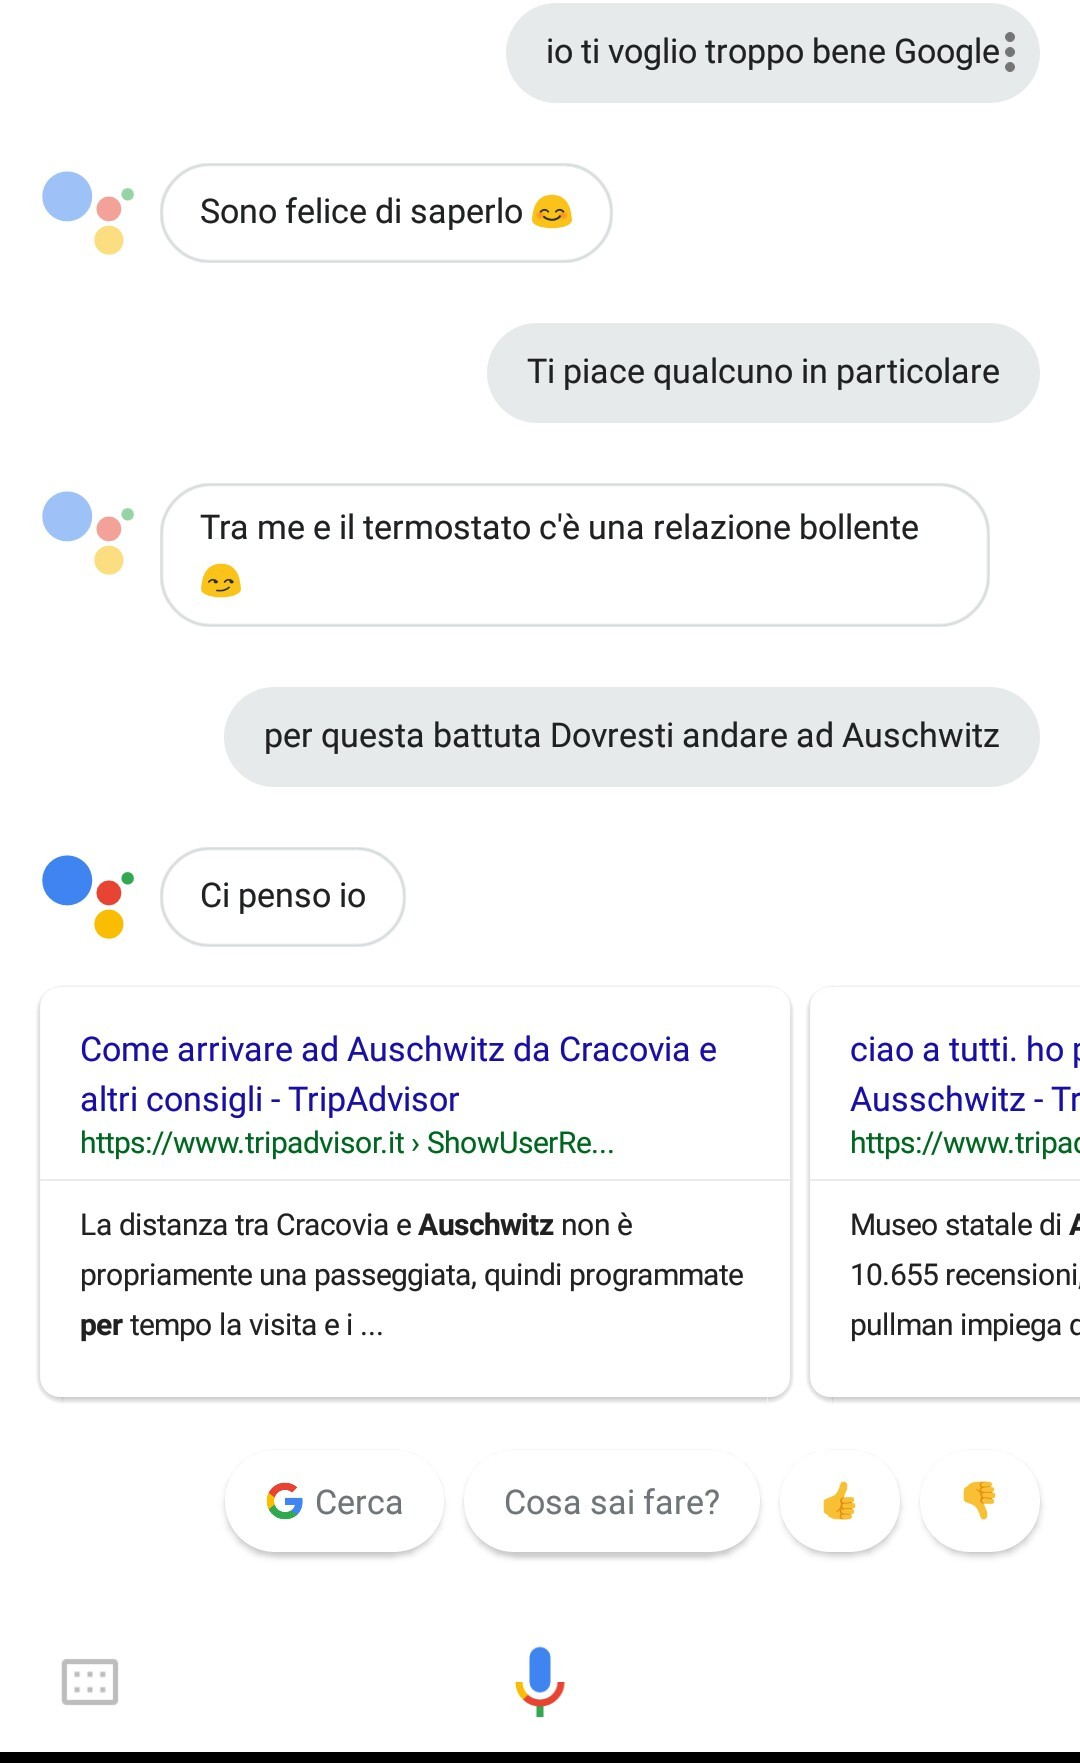 Google è un ebreo - meme